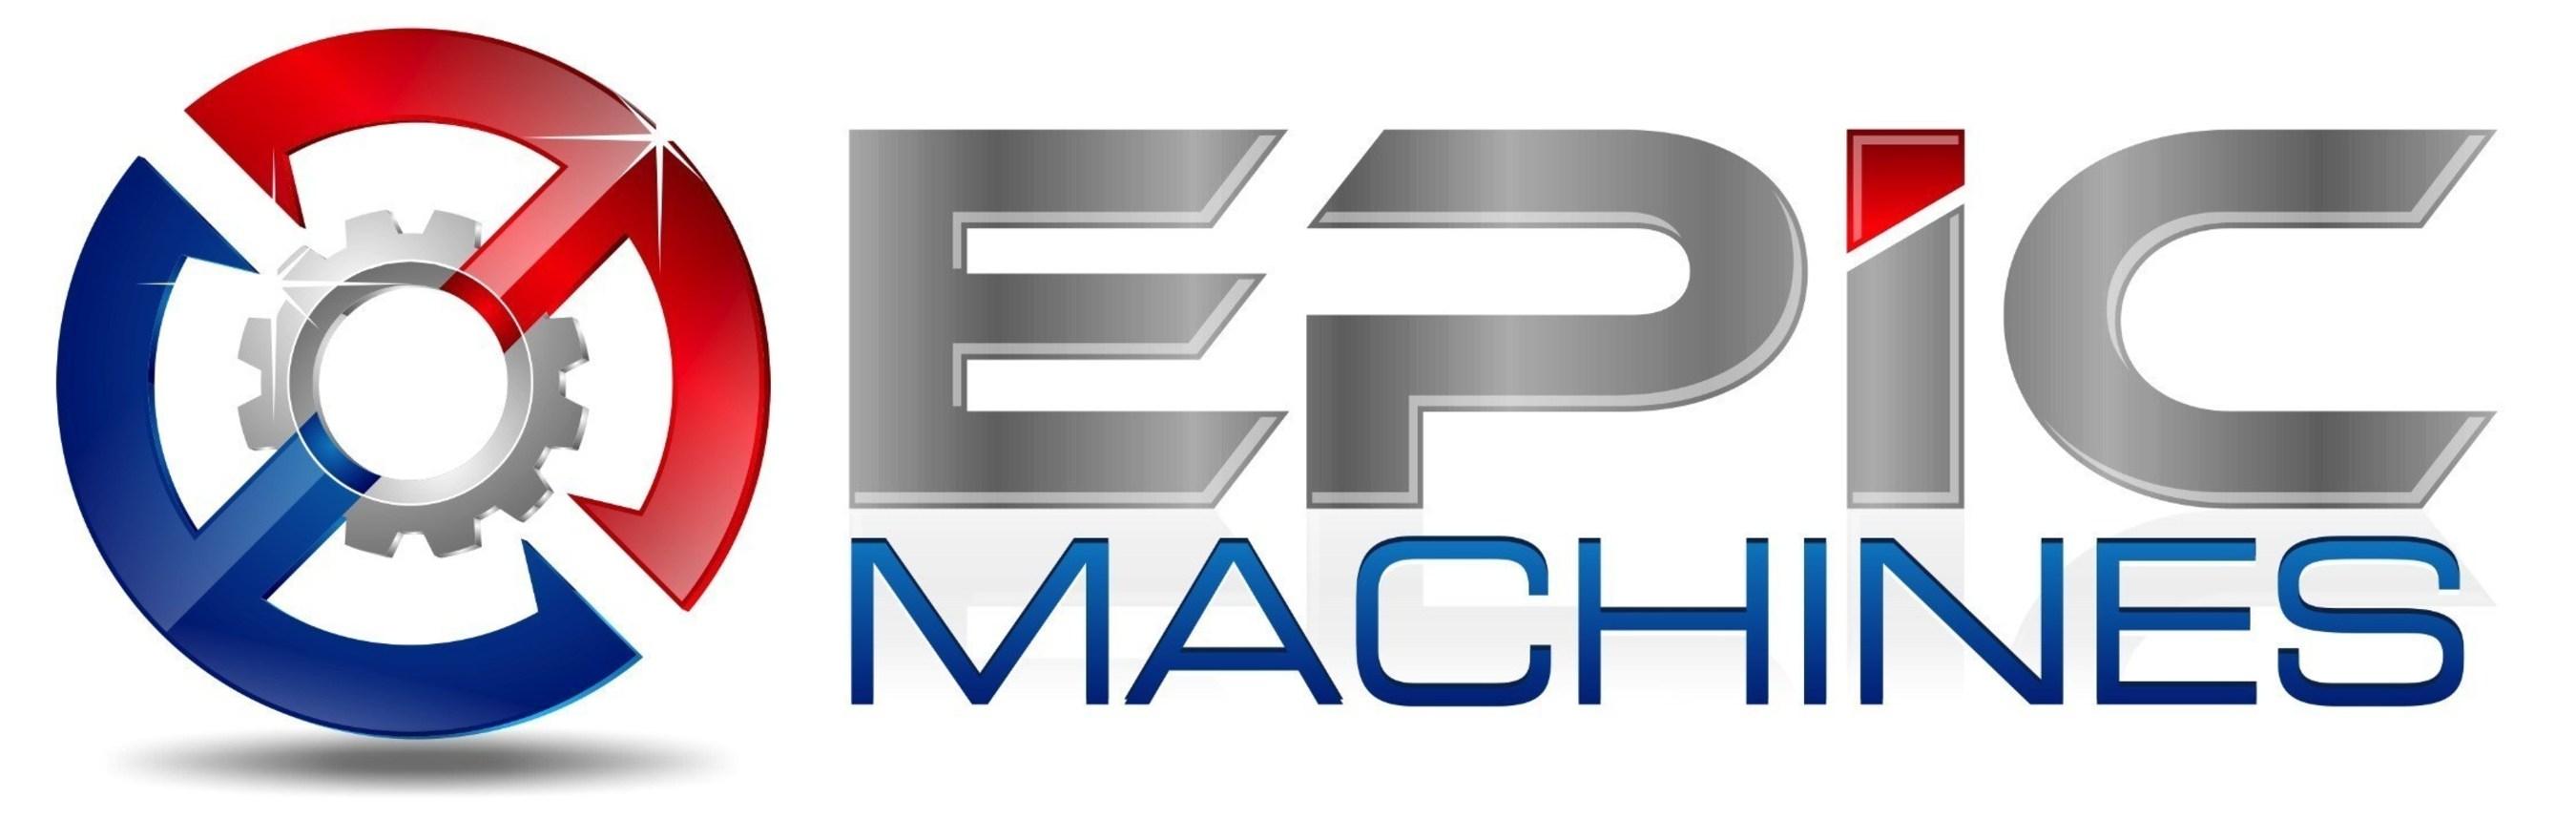 Epic Machines, Inc. Recognized in CRN NEXT-GEN 250